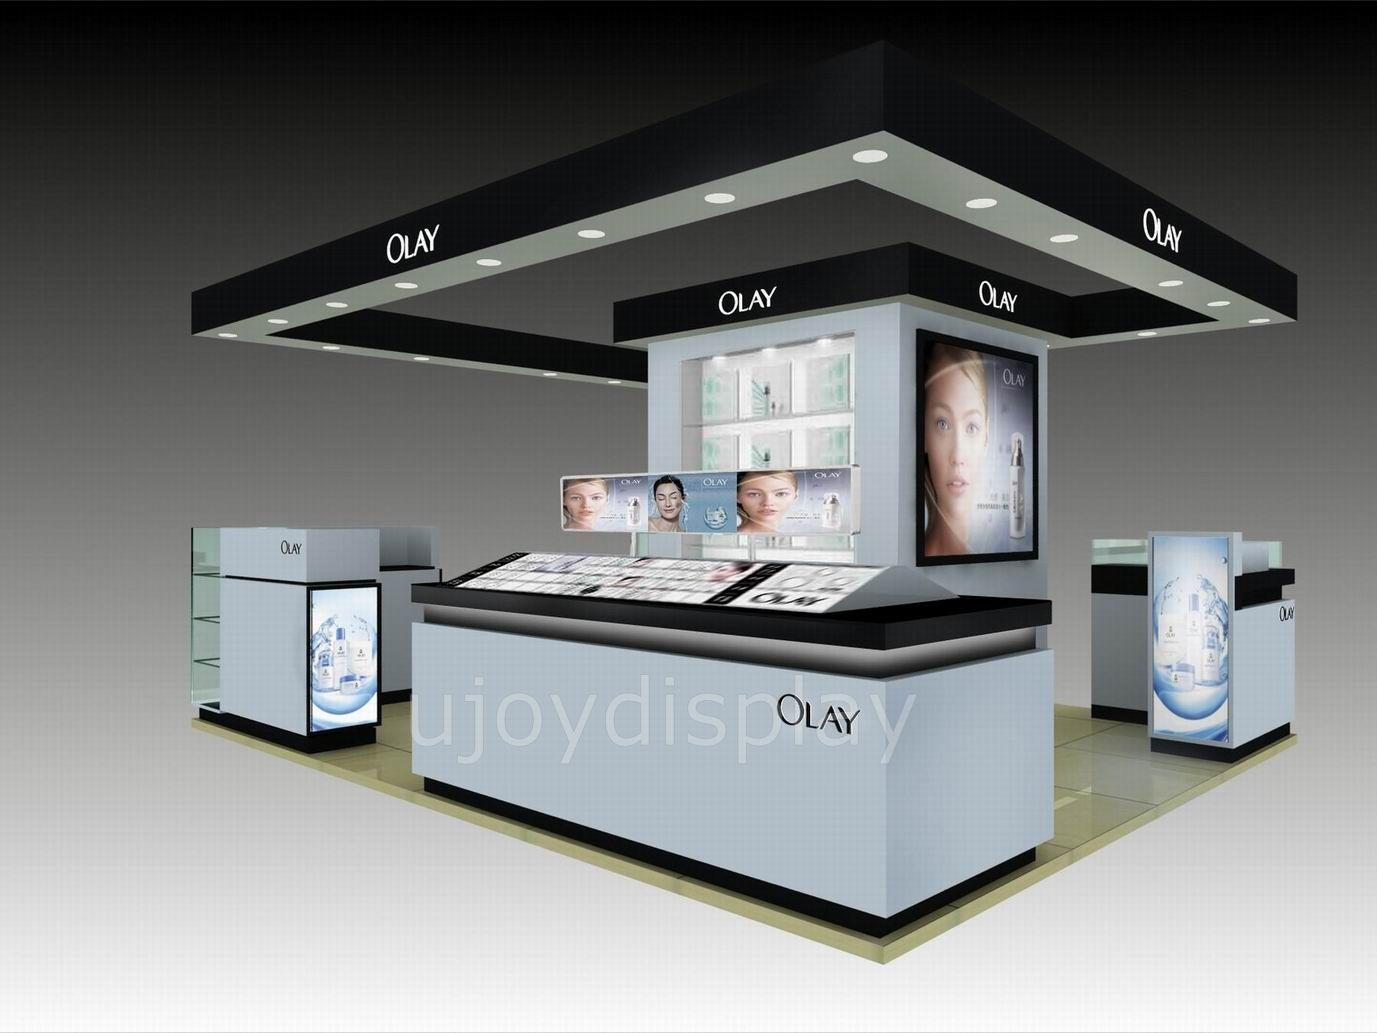 Expo Stands Kioska : Cosmetic mall display kiosk ujoy showcase